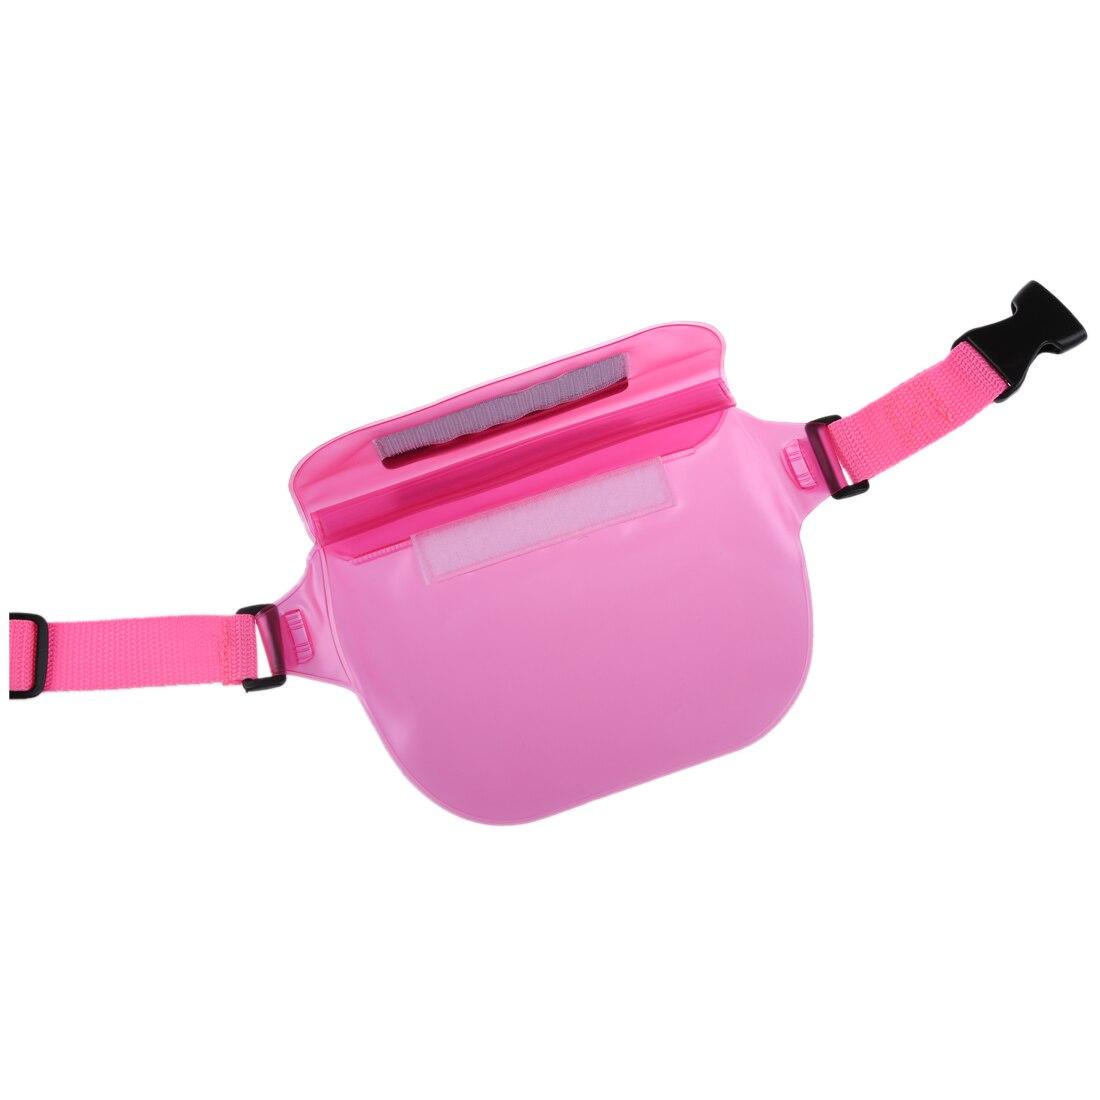 2X Waterproof Bag Rafting Waist Packs for Phone Wallet Purse Compact Camera(pink)